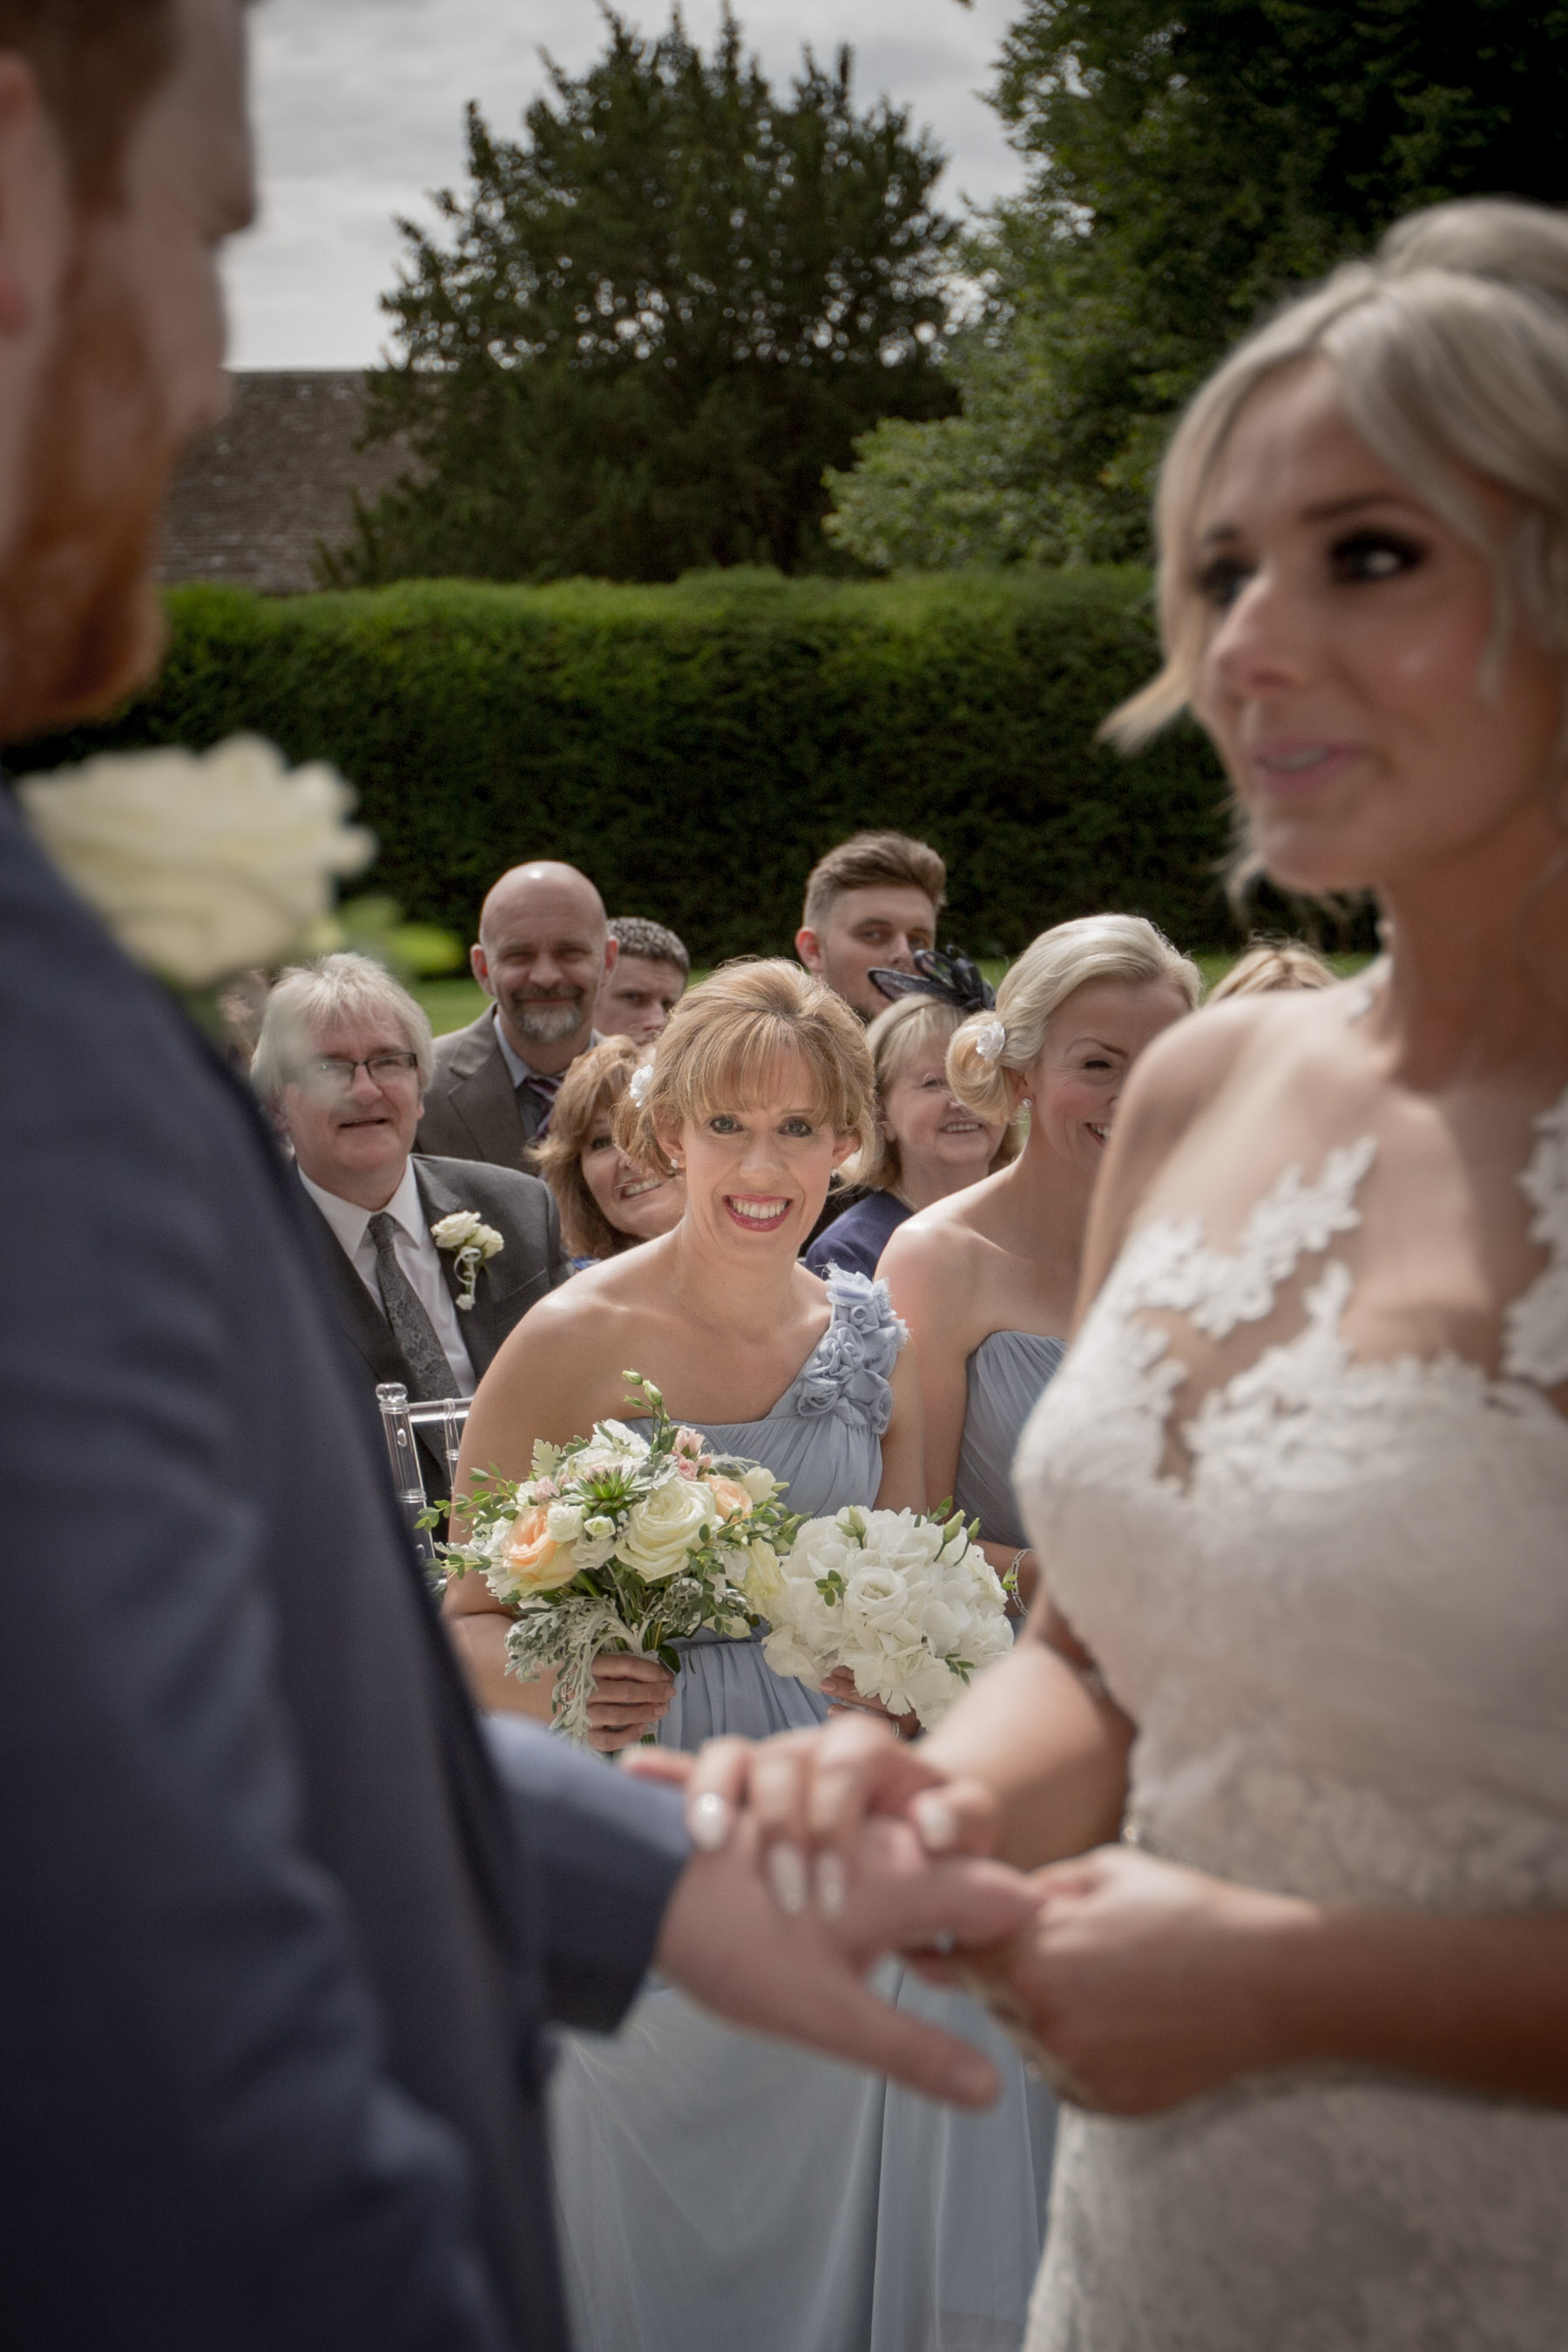 cotswold-wedding-photography-at-stonehouse-court-hotel-natalia-smith-photography-gloucestershire-wedding-photographer-40.jpg